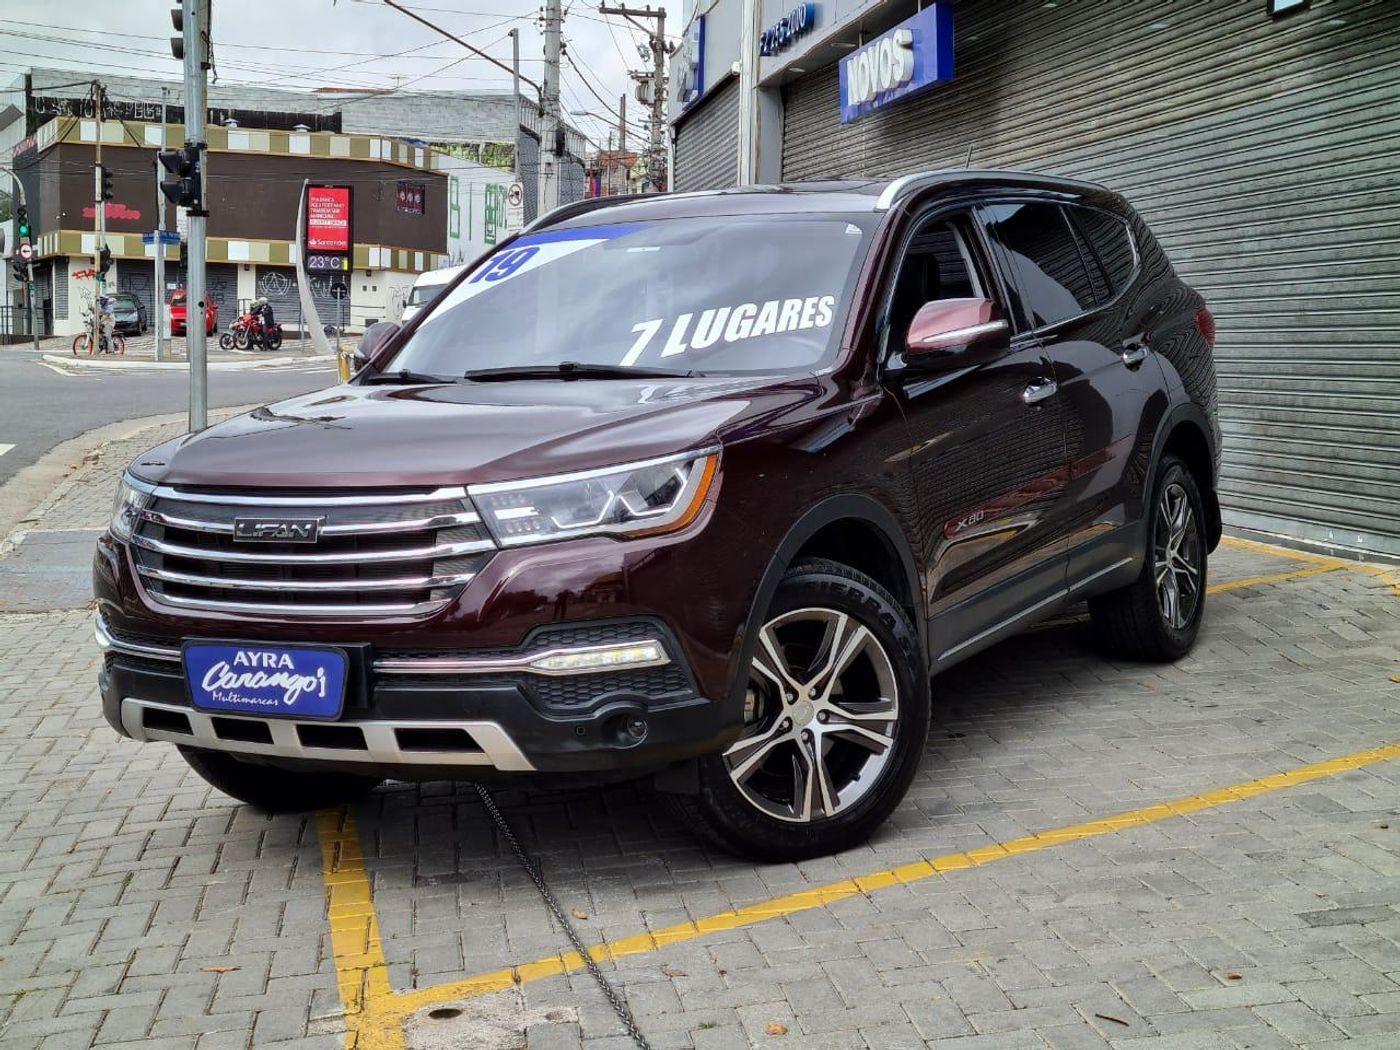 LIFAN X80 VIP 2.0 Turbo 184cv 5p Aut.